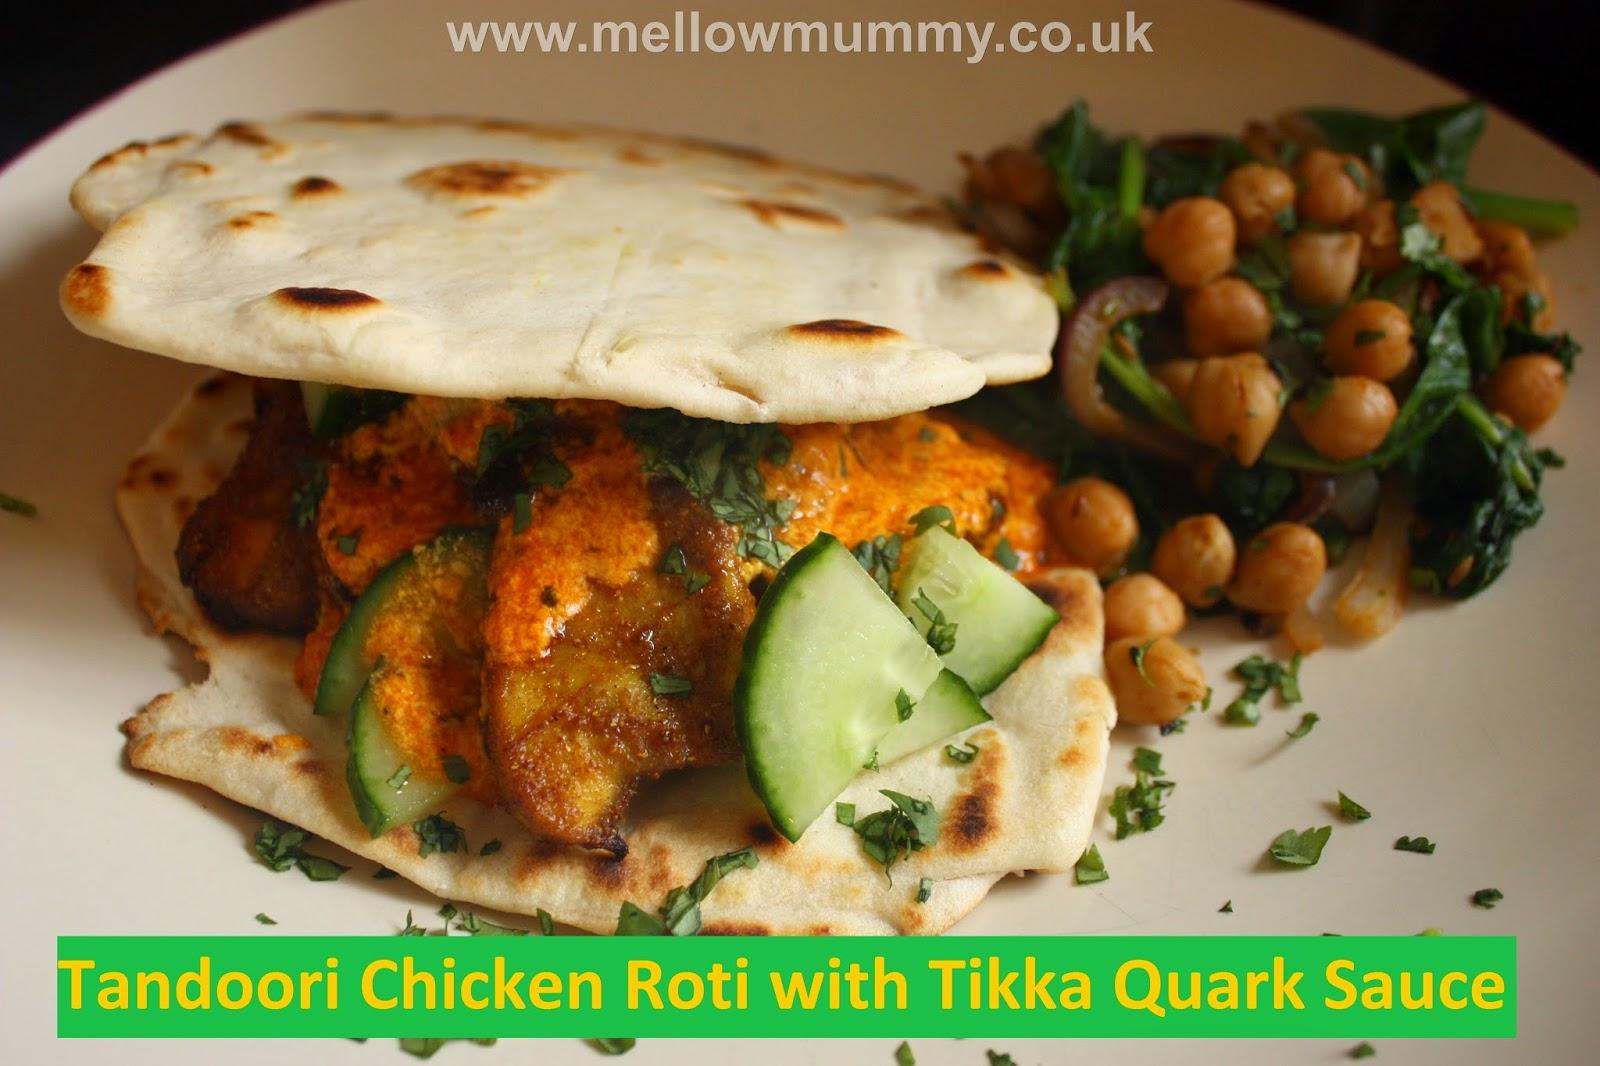 Tandoori chicken roti with Tikka quark sauce